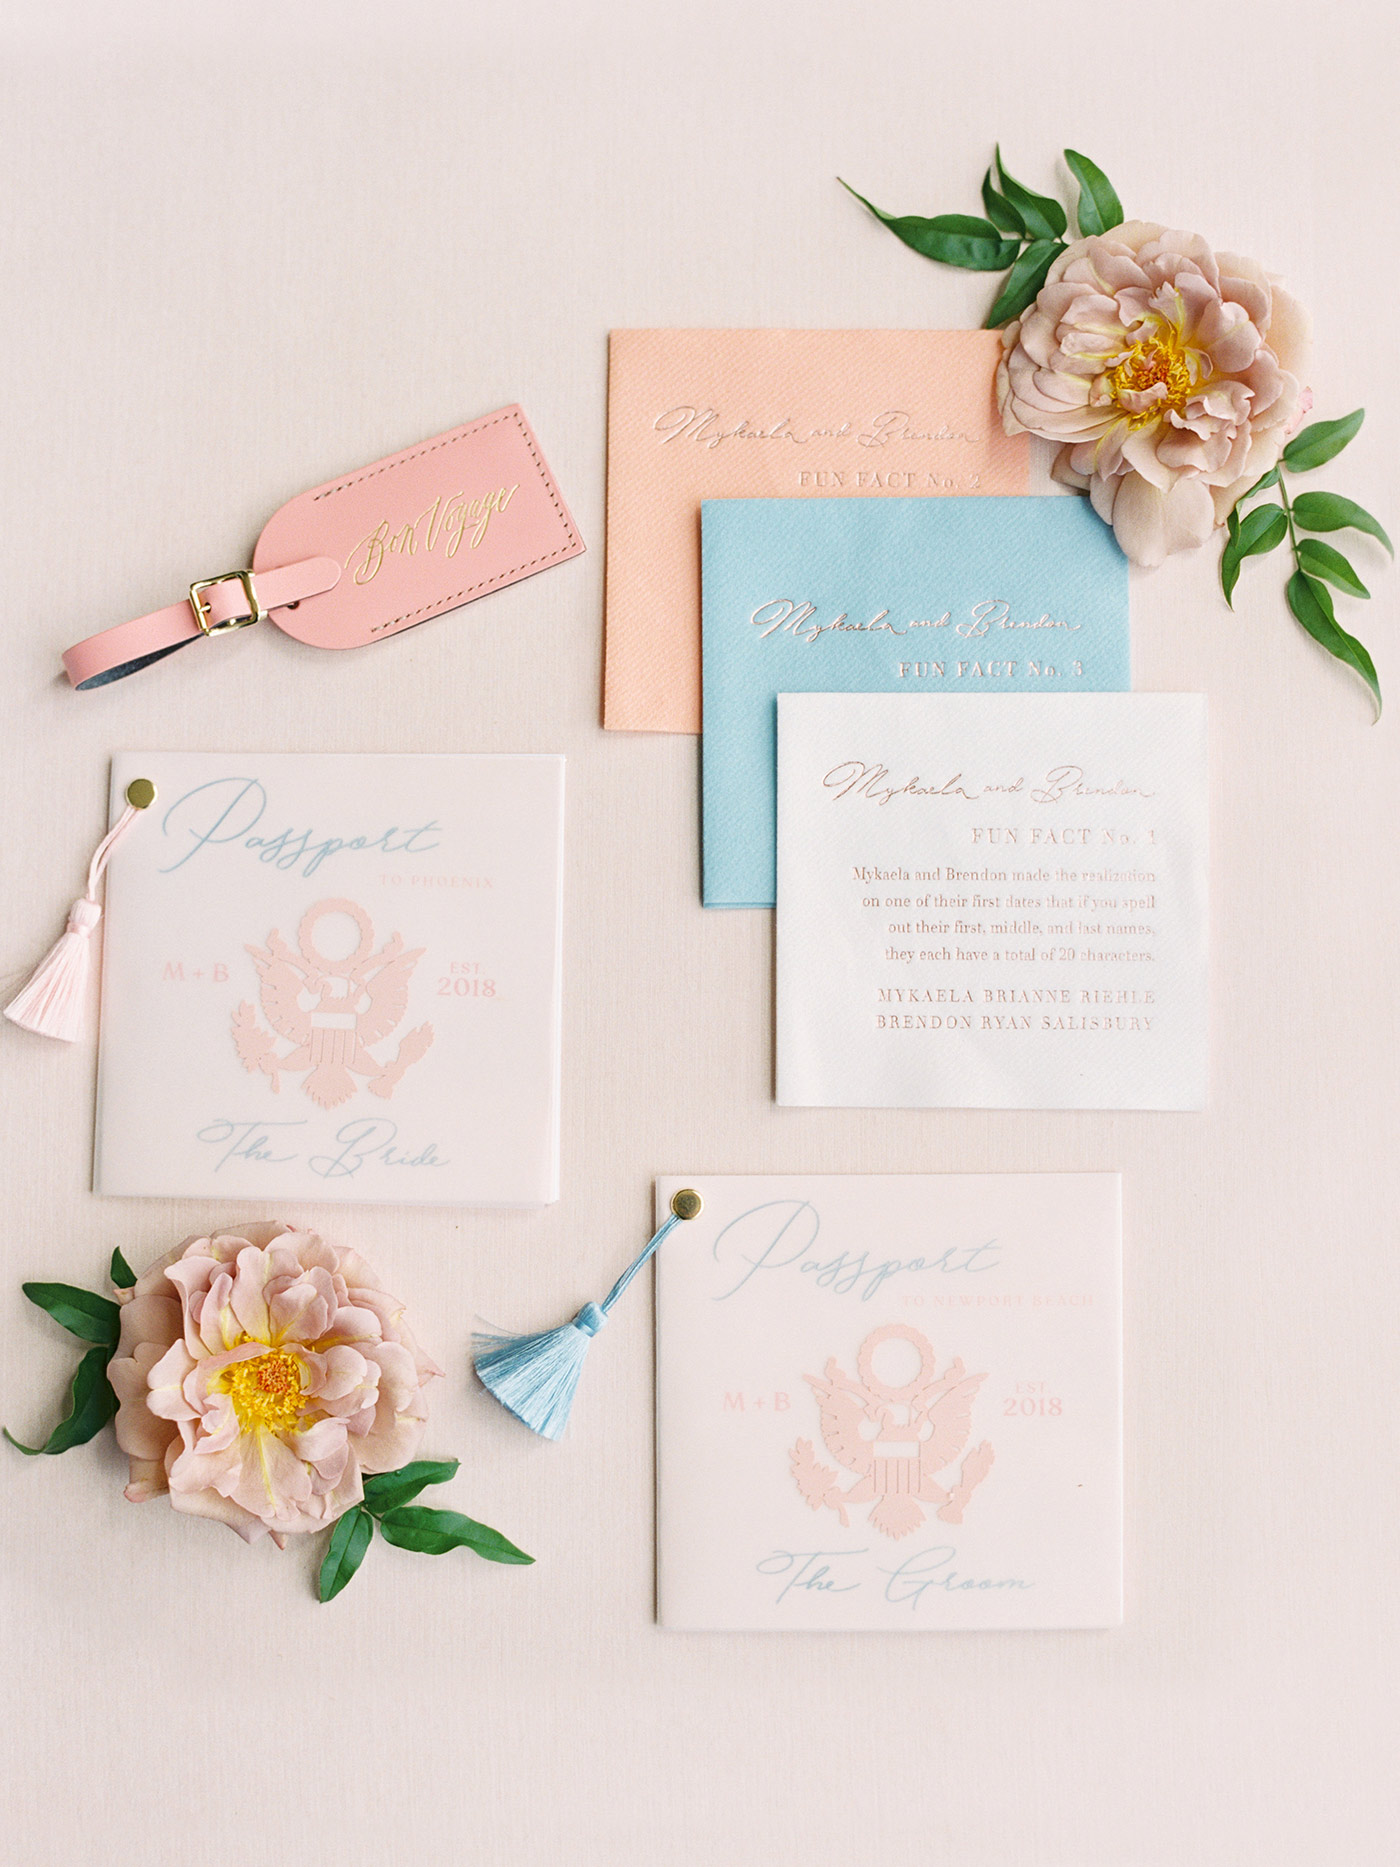 mykaela and brendon wedding passport themed dinner menu